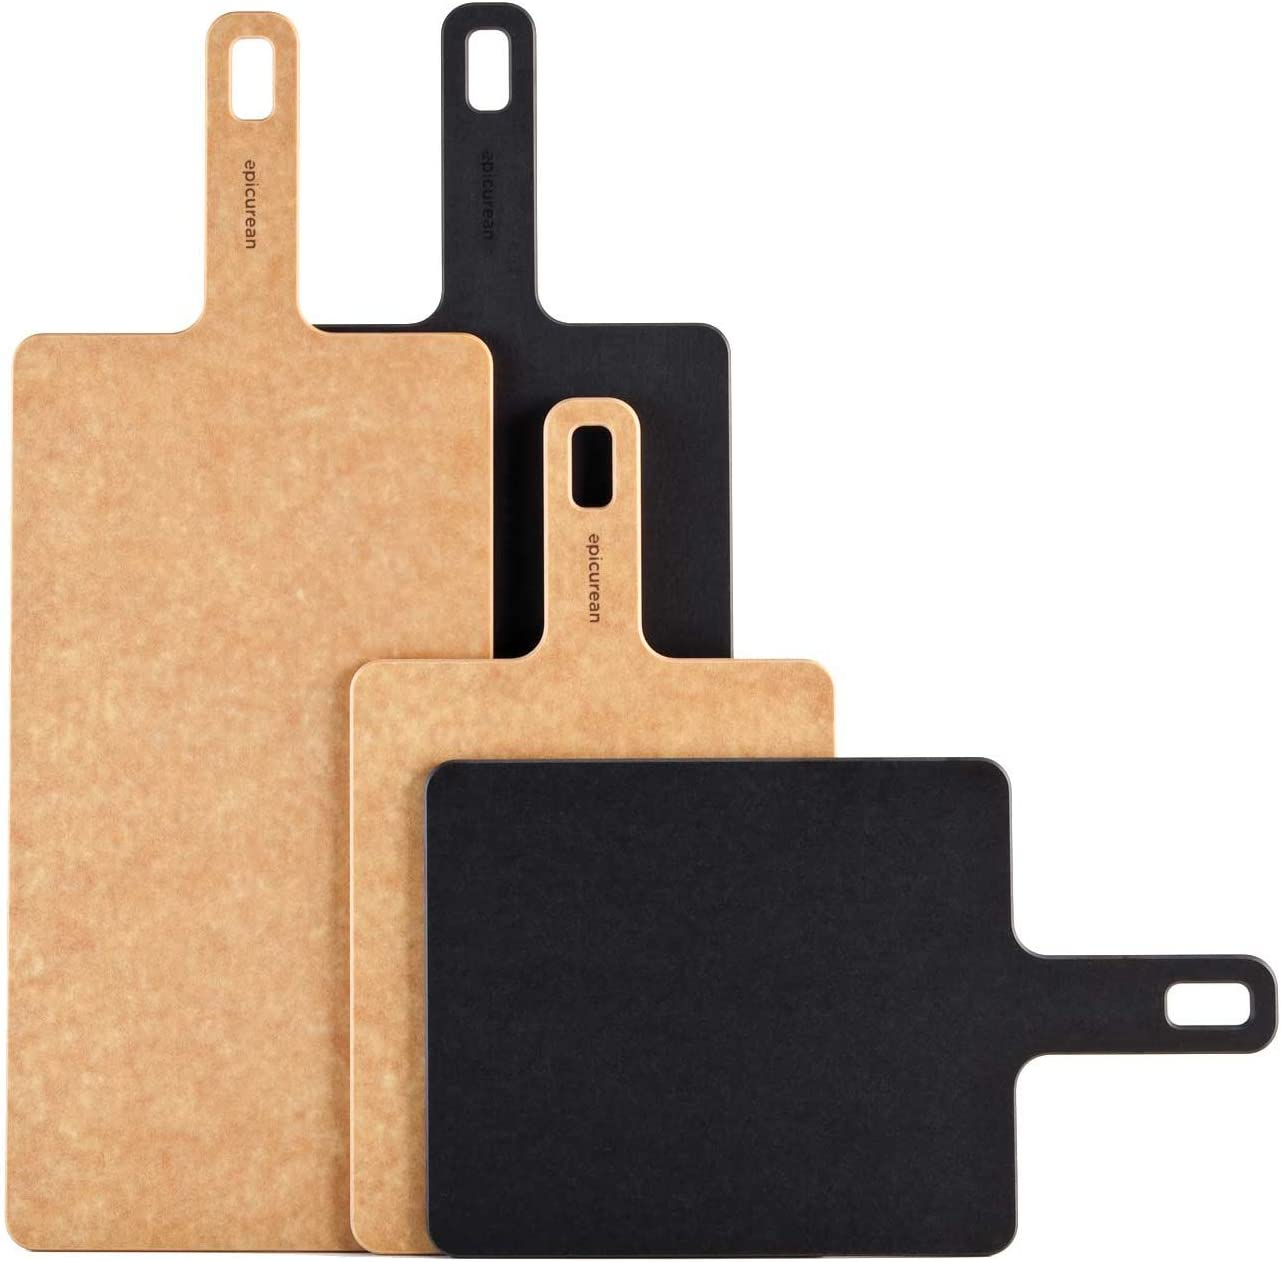 "Epicurean Handy Series 9/"" x 7/"" Cutting Board-Natural,008-090701,Brown,Composite"